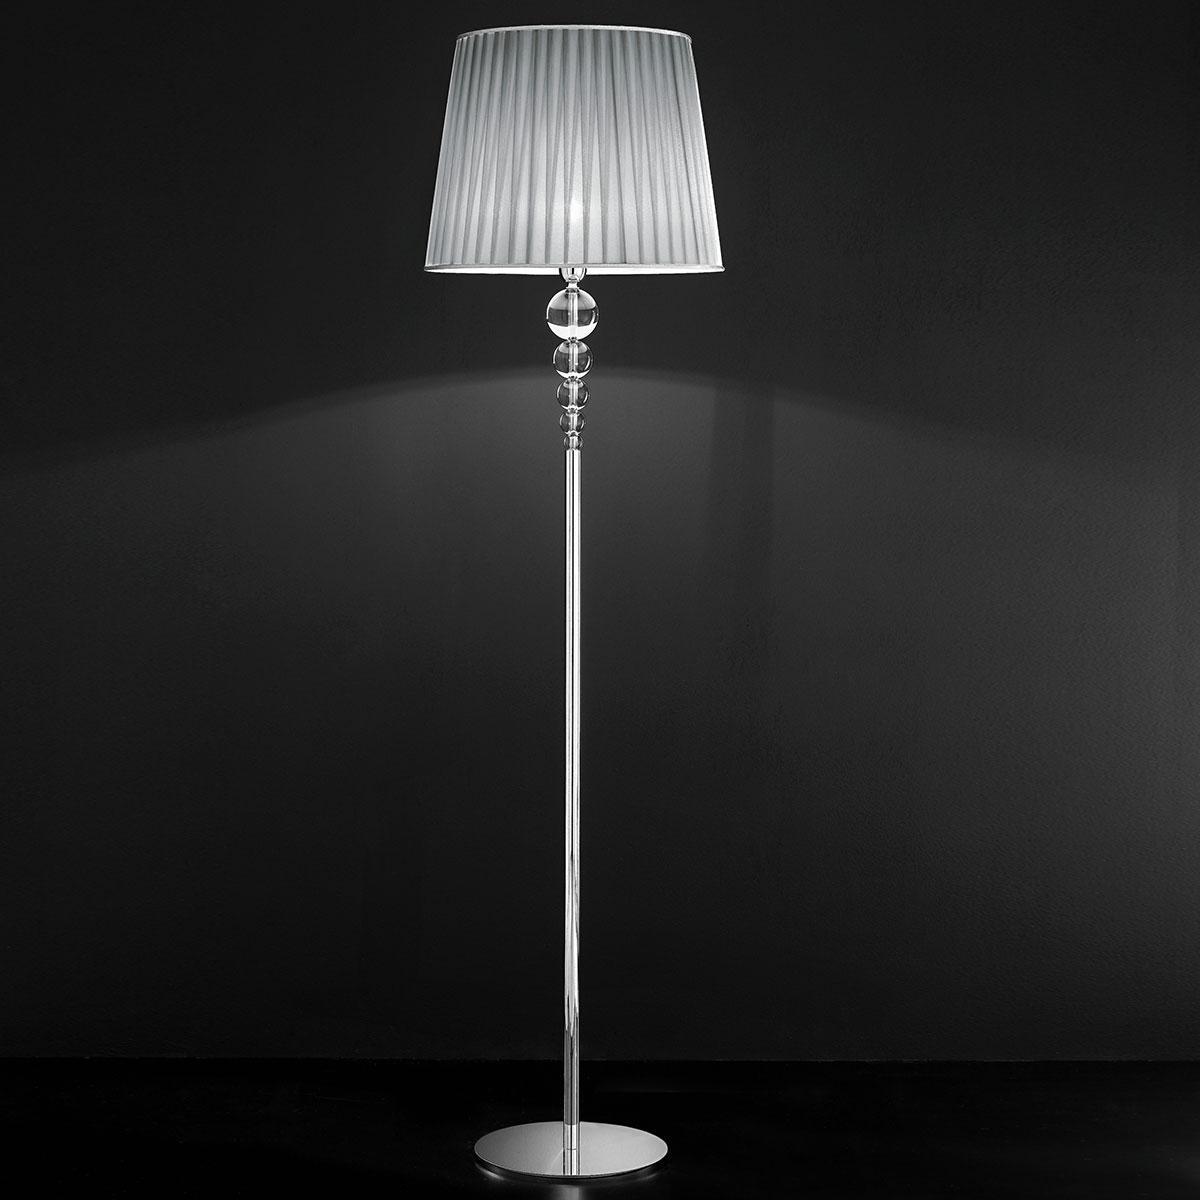 """Marianini"" lampara de pie veneciana en cristal - 1 luce - transparente"